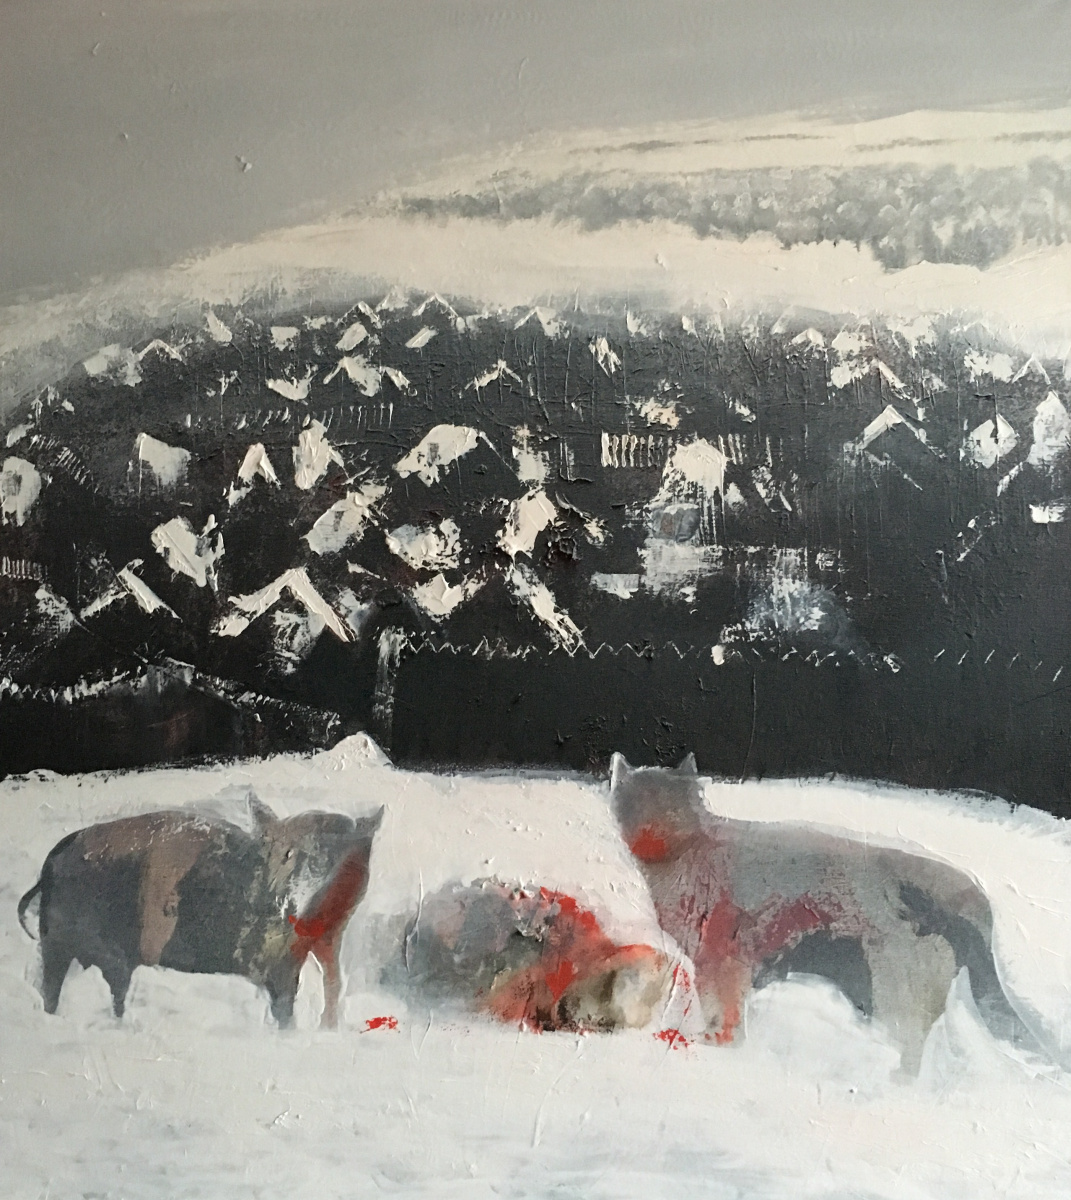 Nikolai margin. Winter in the village